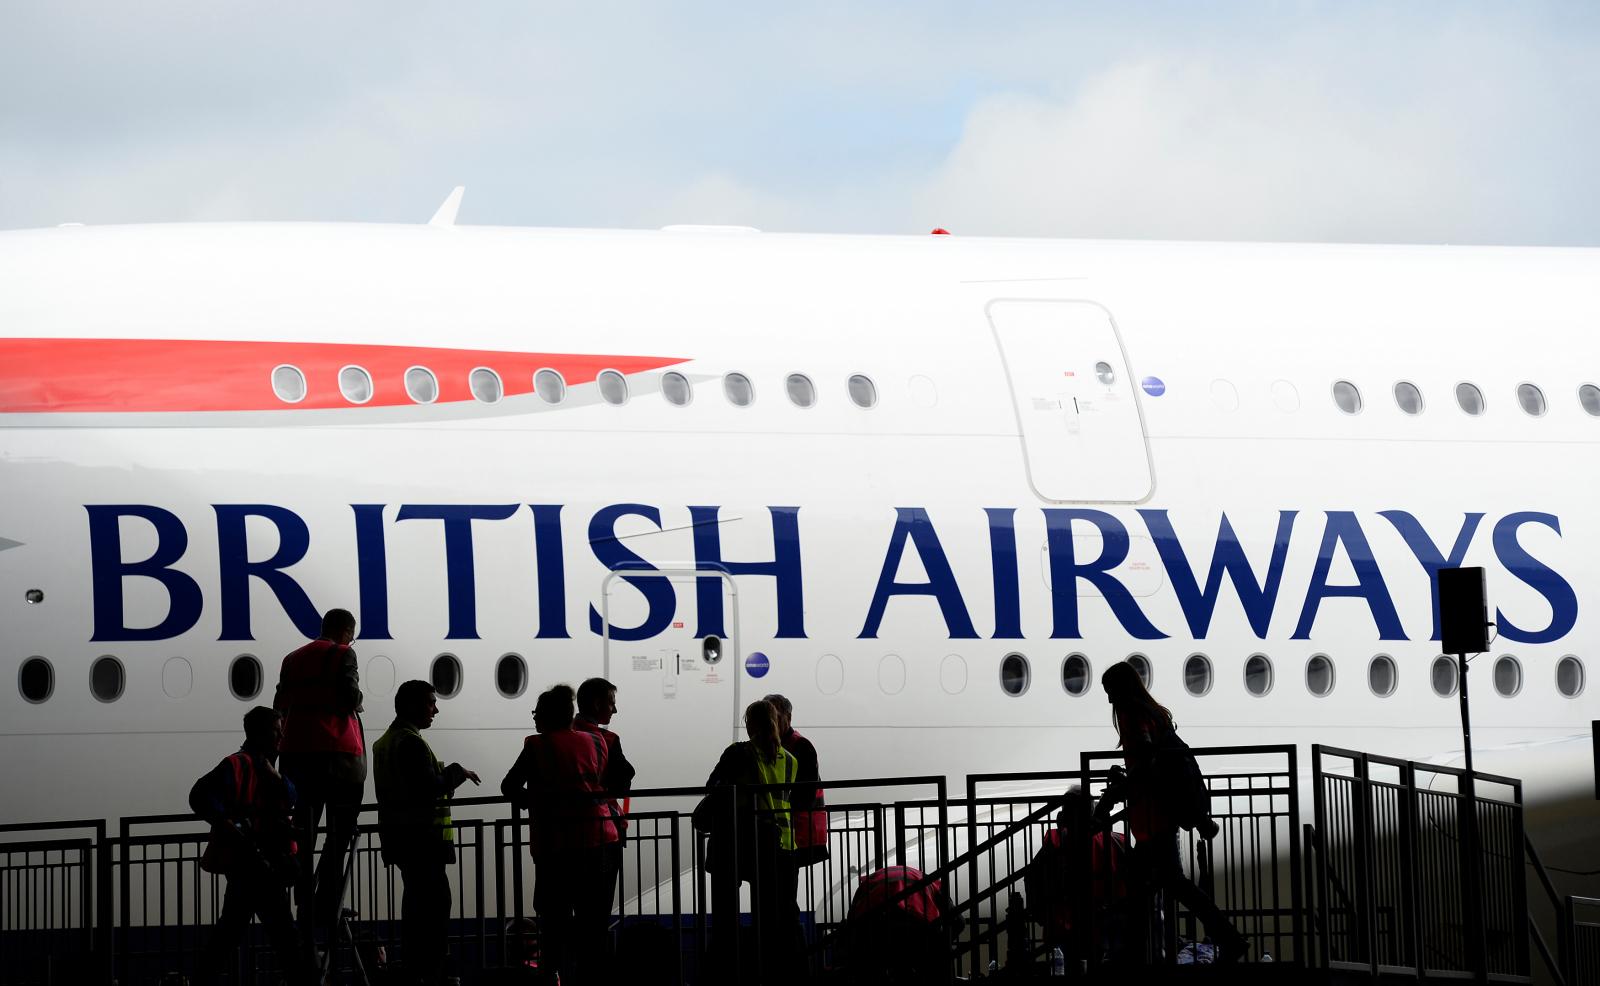 380,000 British Airways customers' credit card details stolen by criminals - Dotemirates